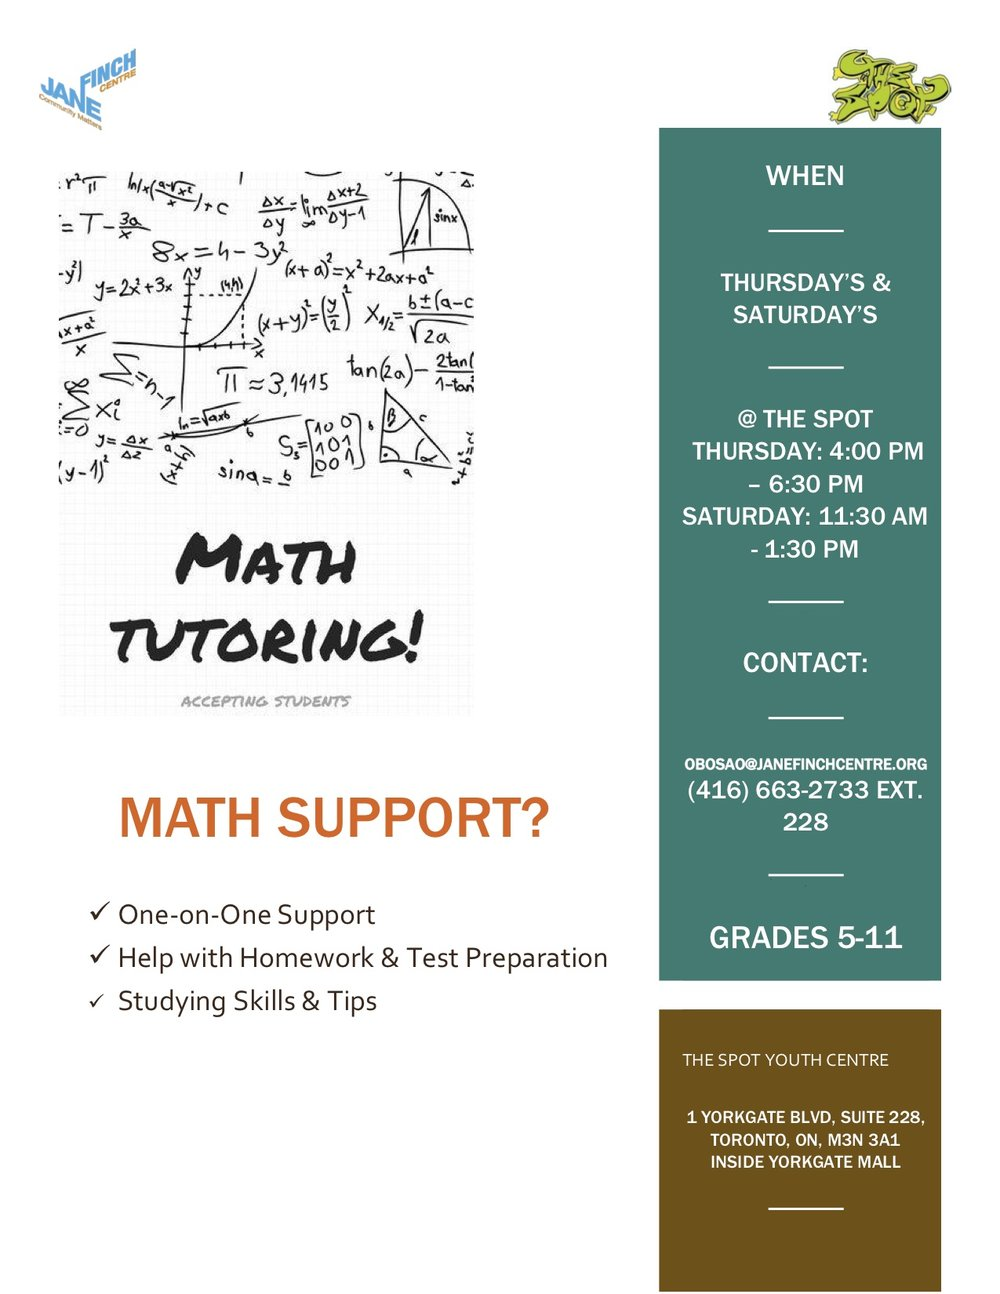 NEED A tutor - Math Support Flyer  copy.jpg